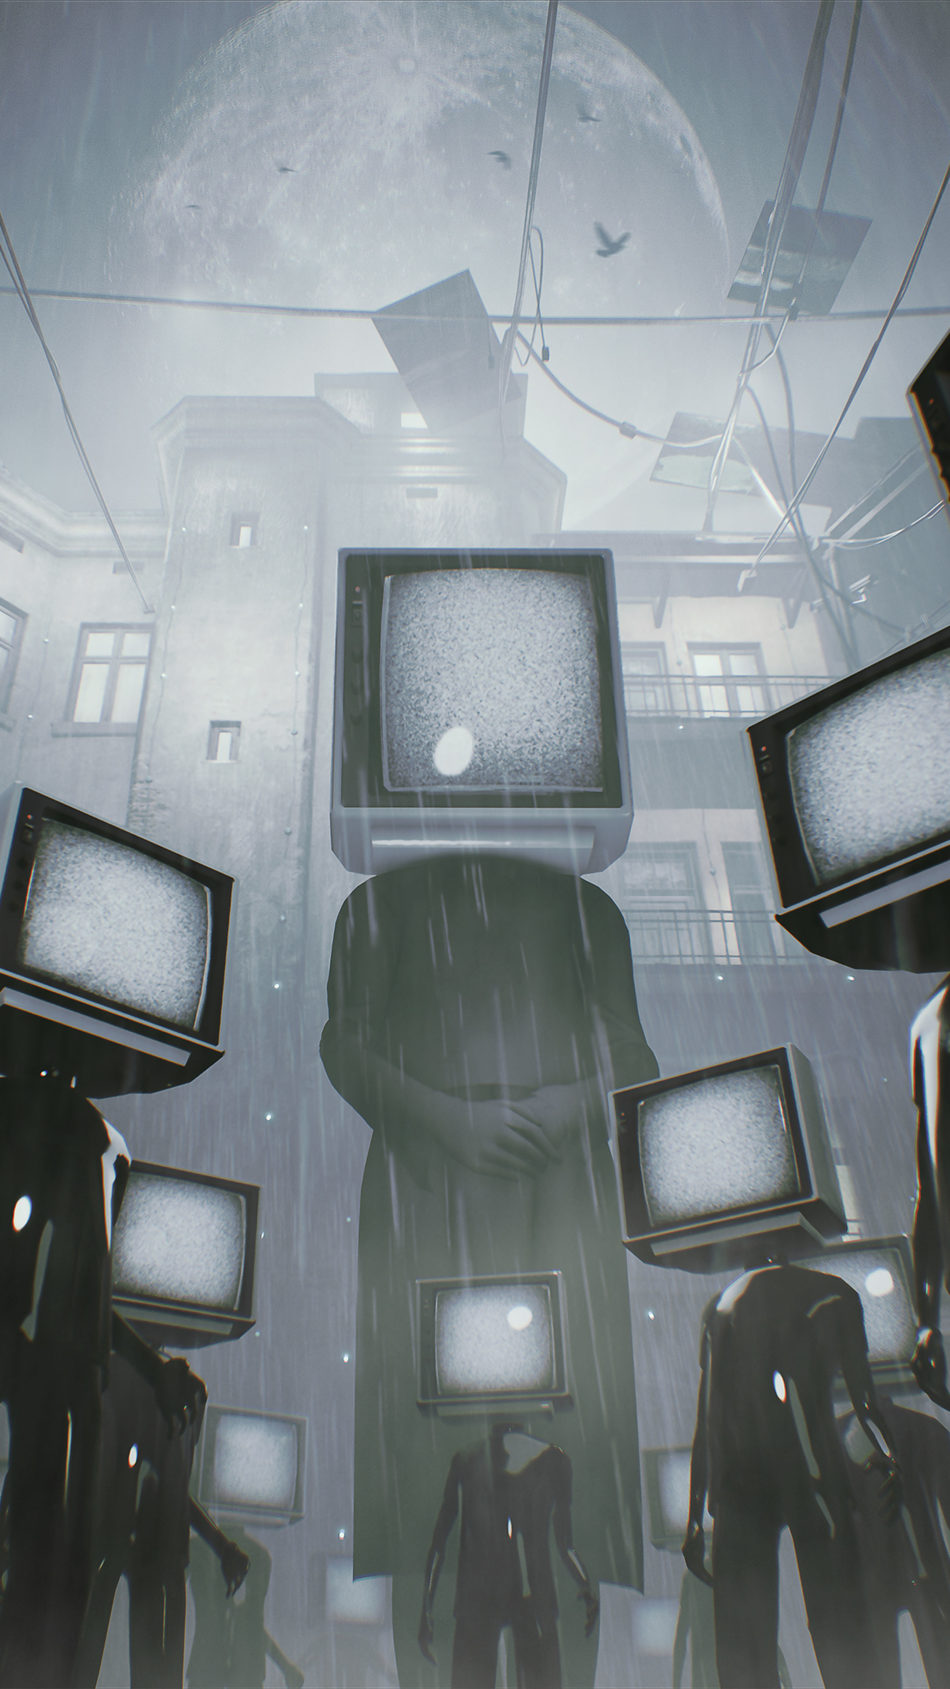 Observer System Redux Game Poster 4K Ultra HD Mobile Wallpaper